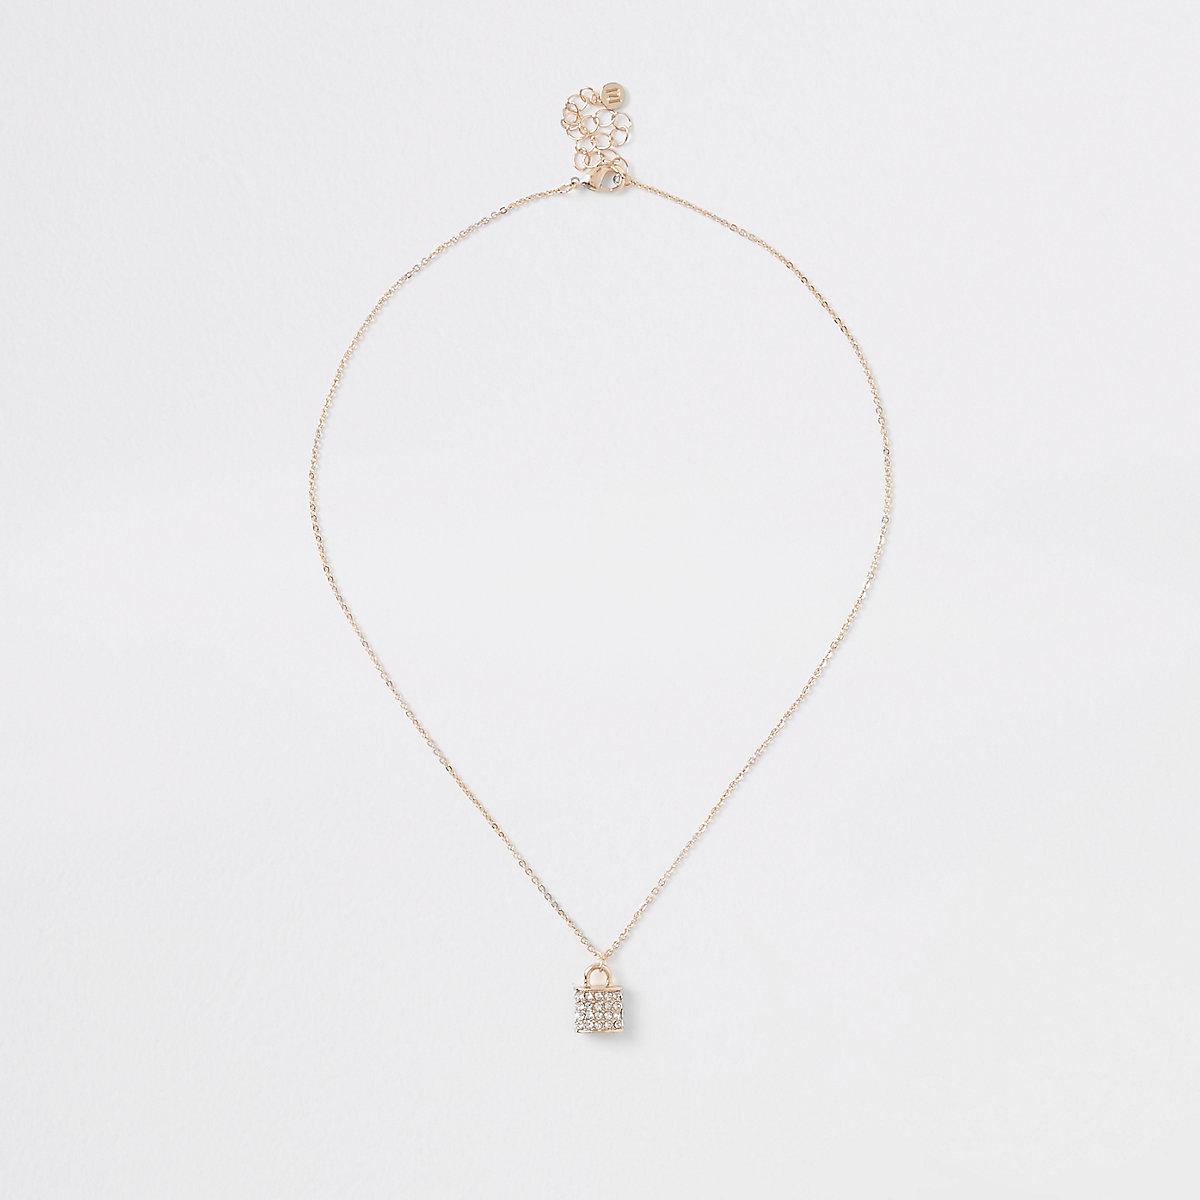 Gold tone diamante paved padlock necklace